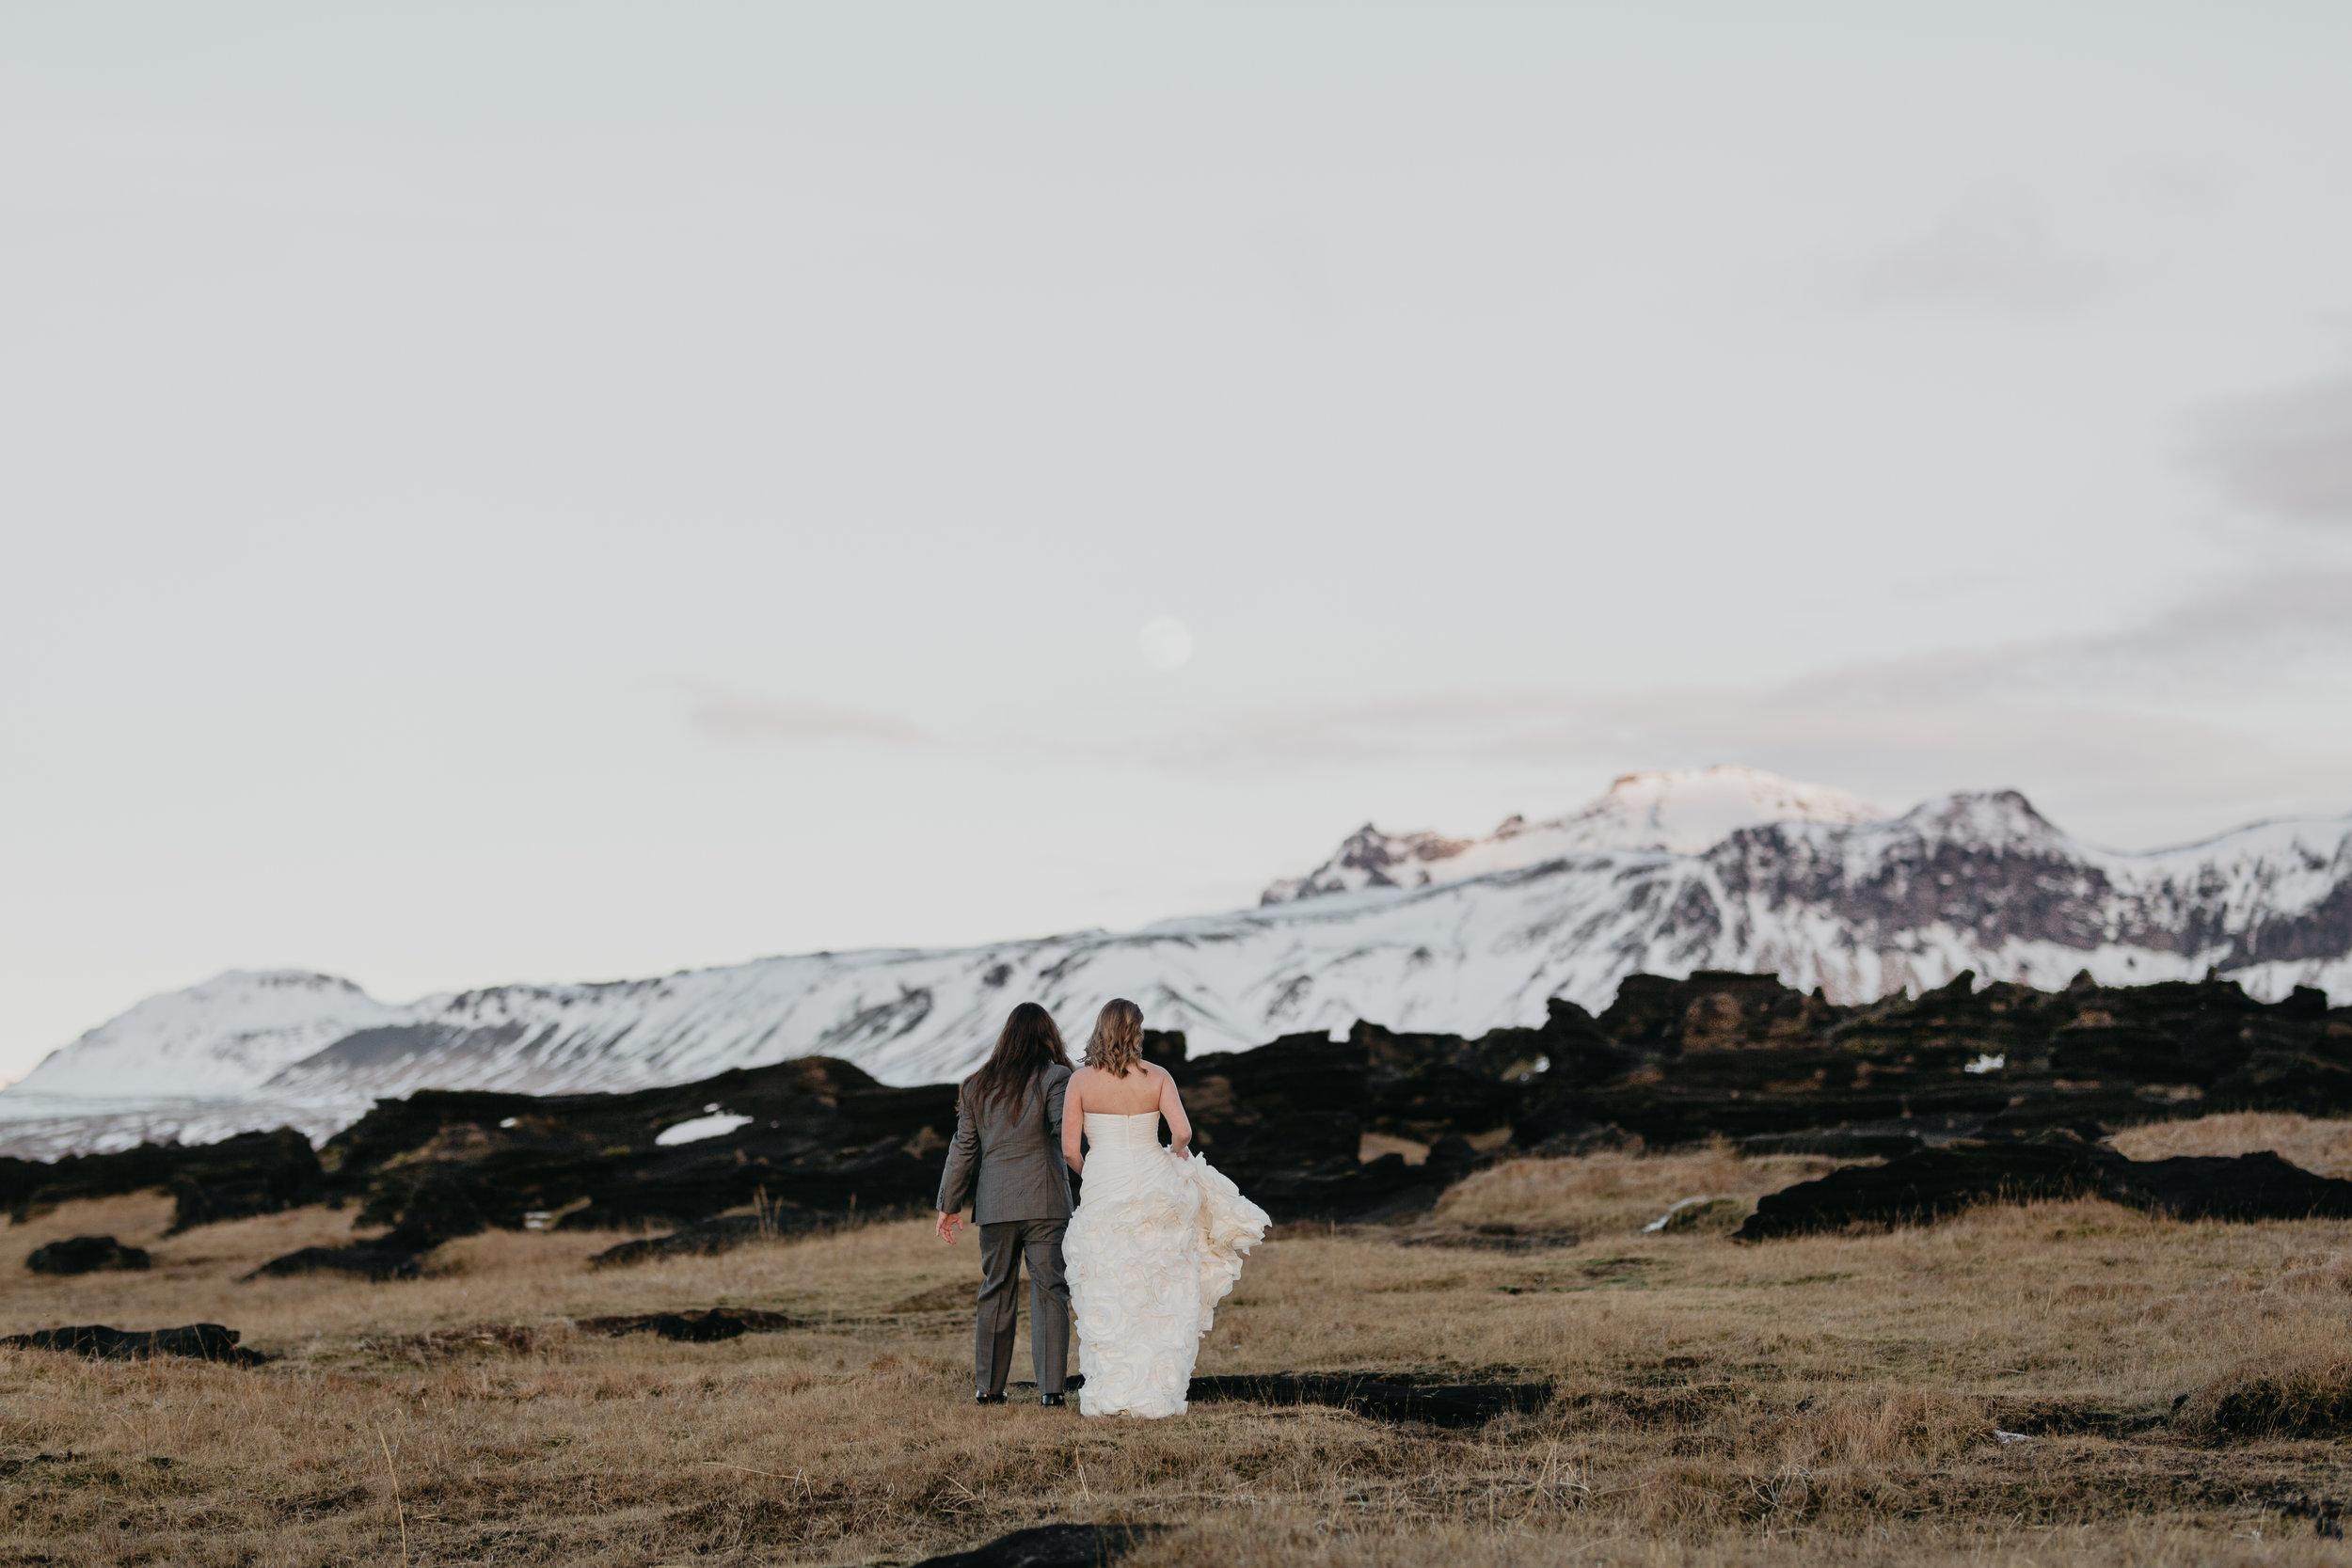 nicole-daacke-photography-iceland-winter-sunset-adventure-elopement-skogafoss-waterfall-black-sand-beach-dyrholaey-vik-iceland-intimate-wedding-black-church-elopement-photographer-24.jpg